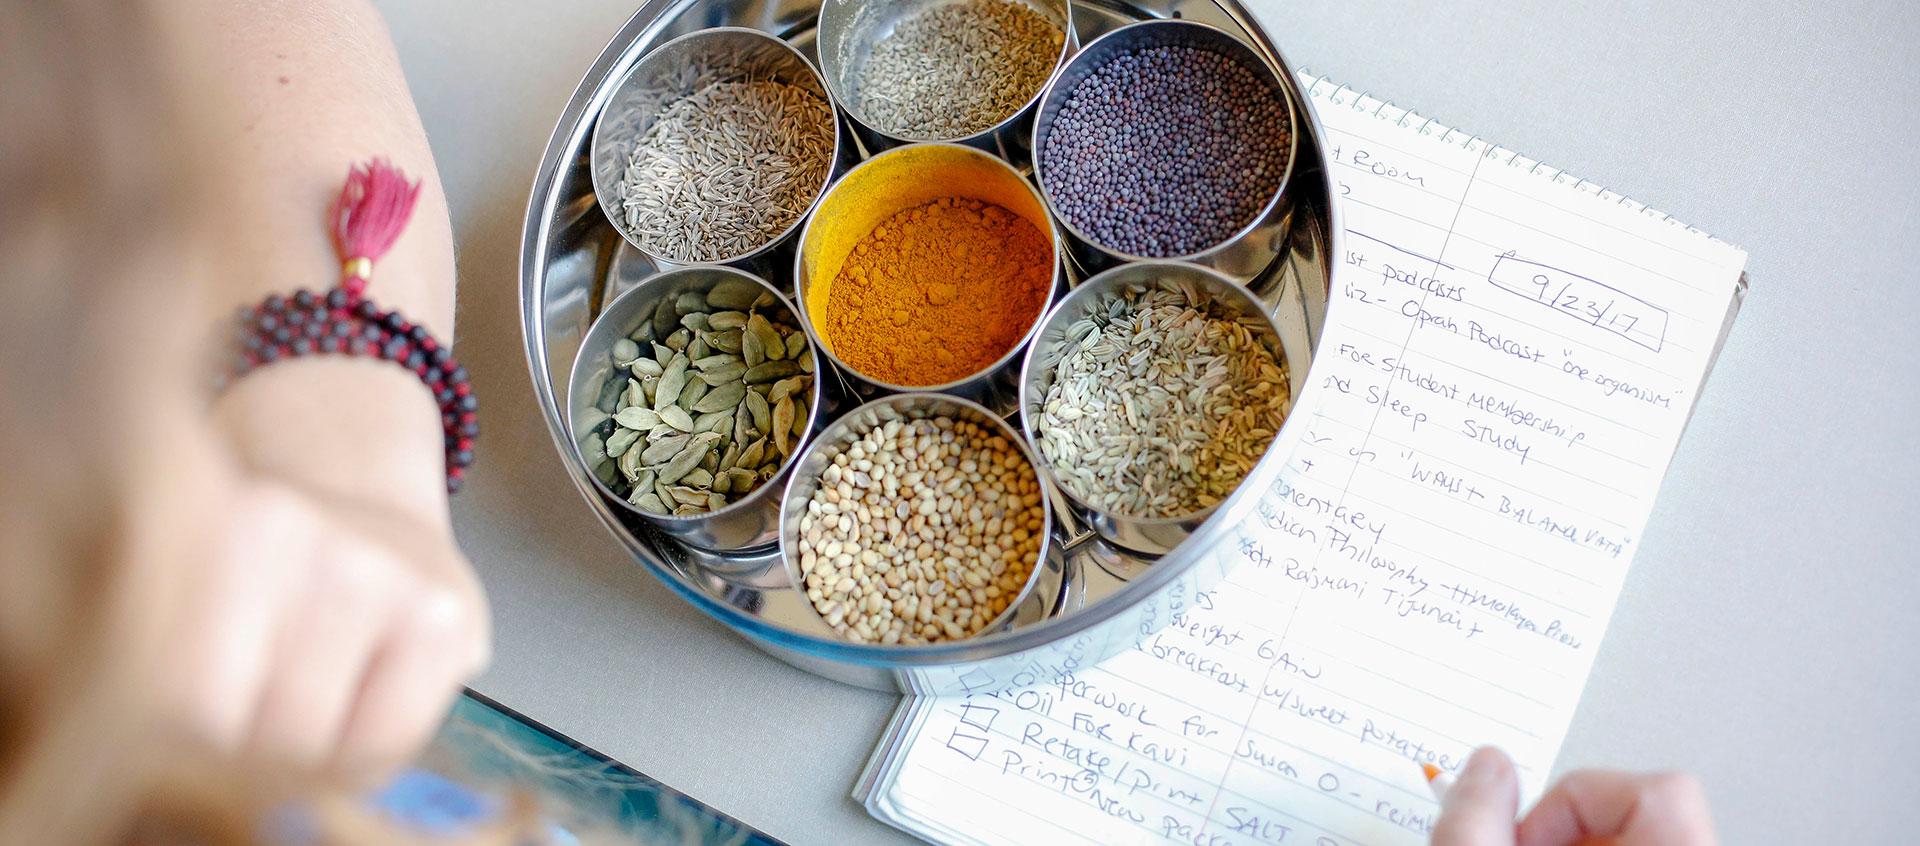 What Does an Ayurvedic Health Counselor Do? | Kripalu